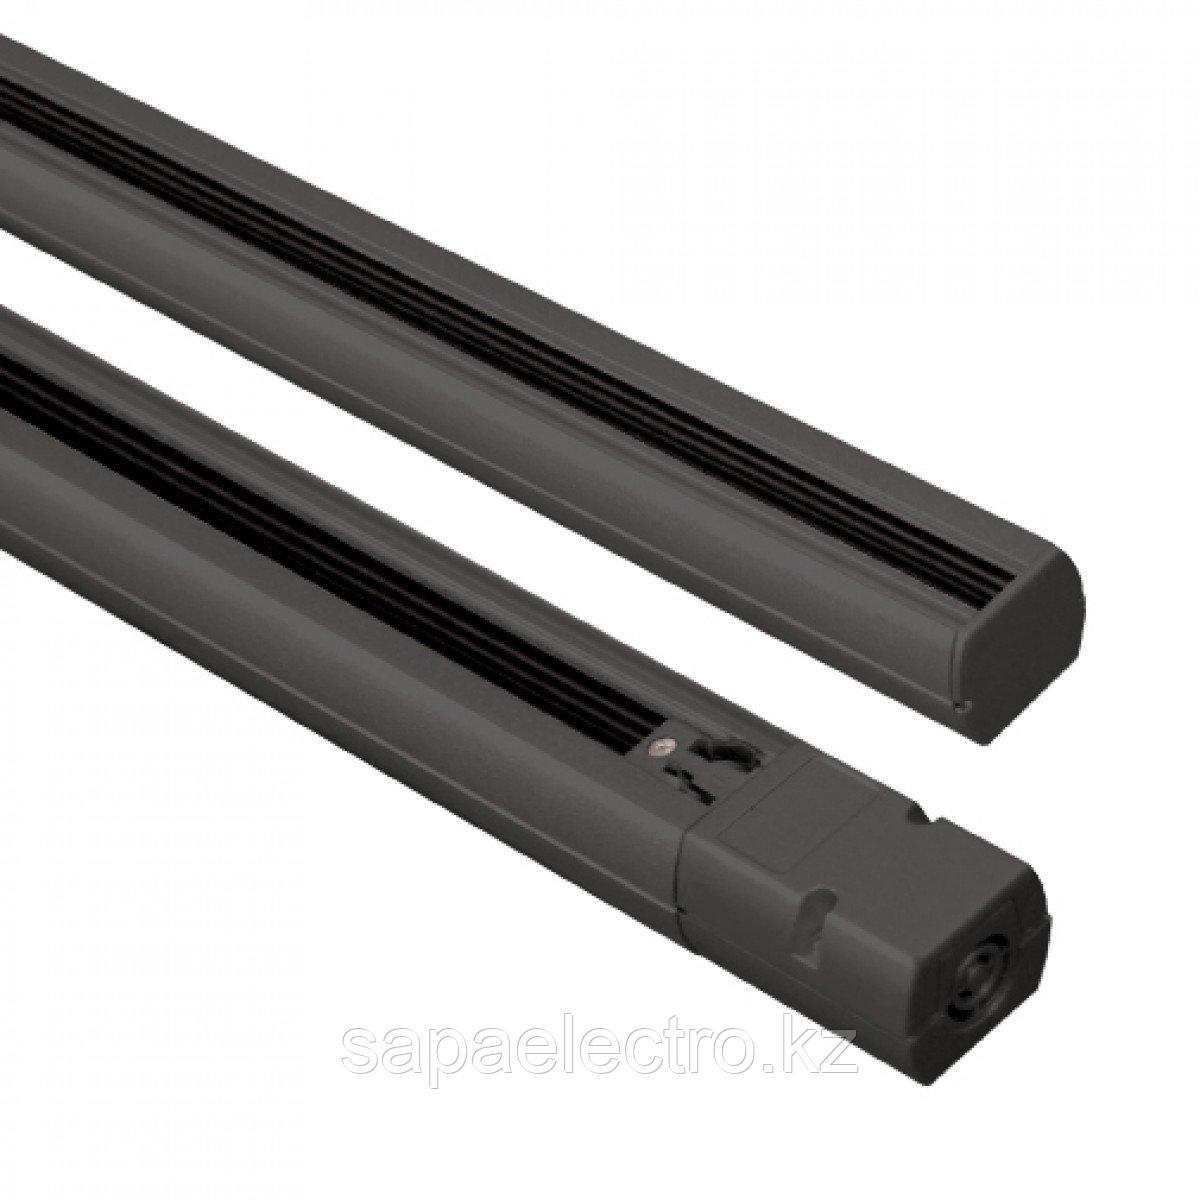 M. BLACK TRACK  1м   (4 LINE)   (TEKSAN)10шт